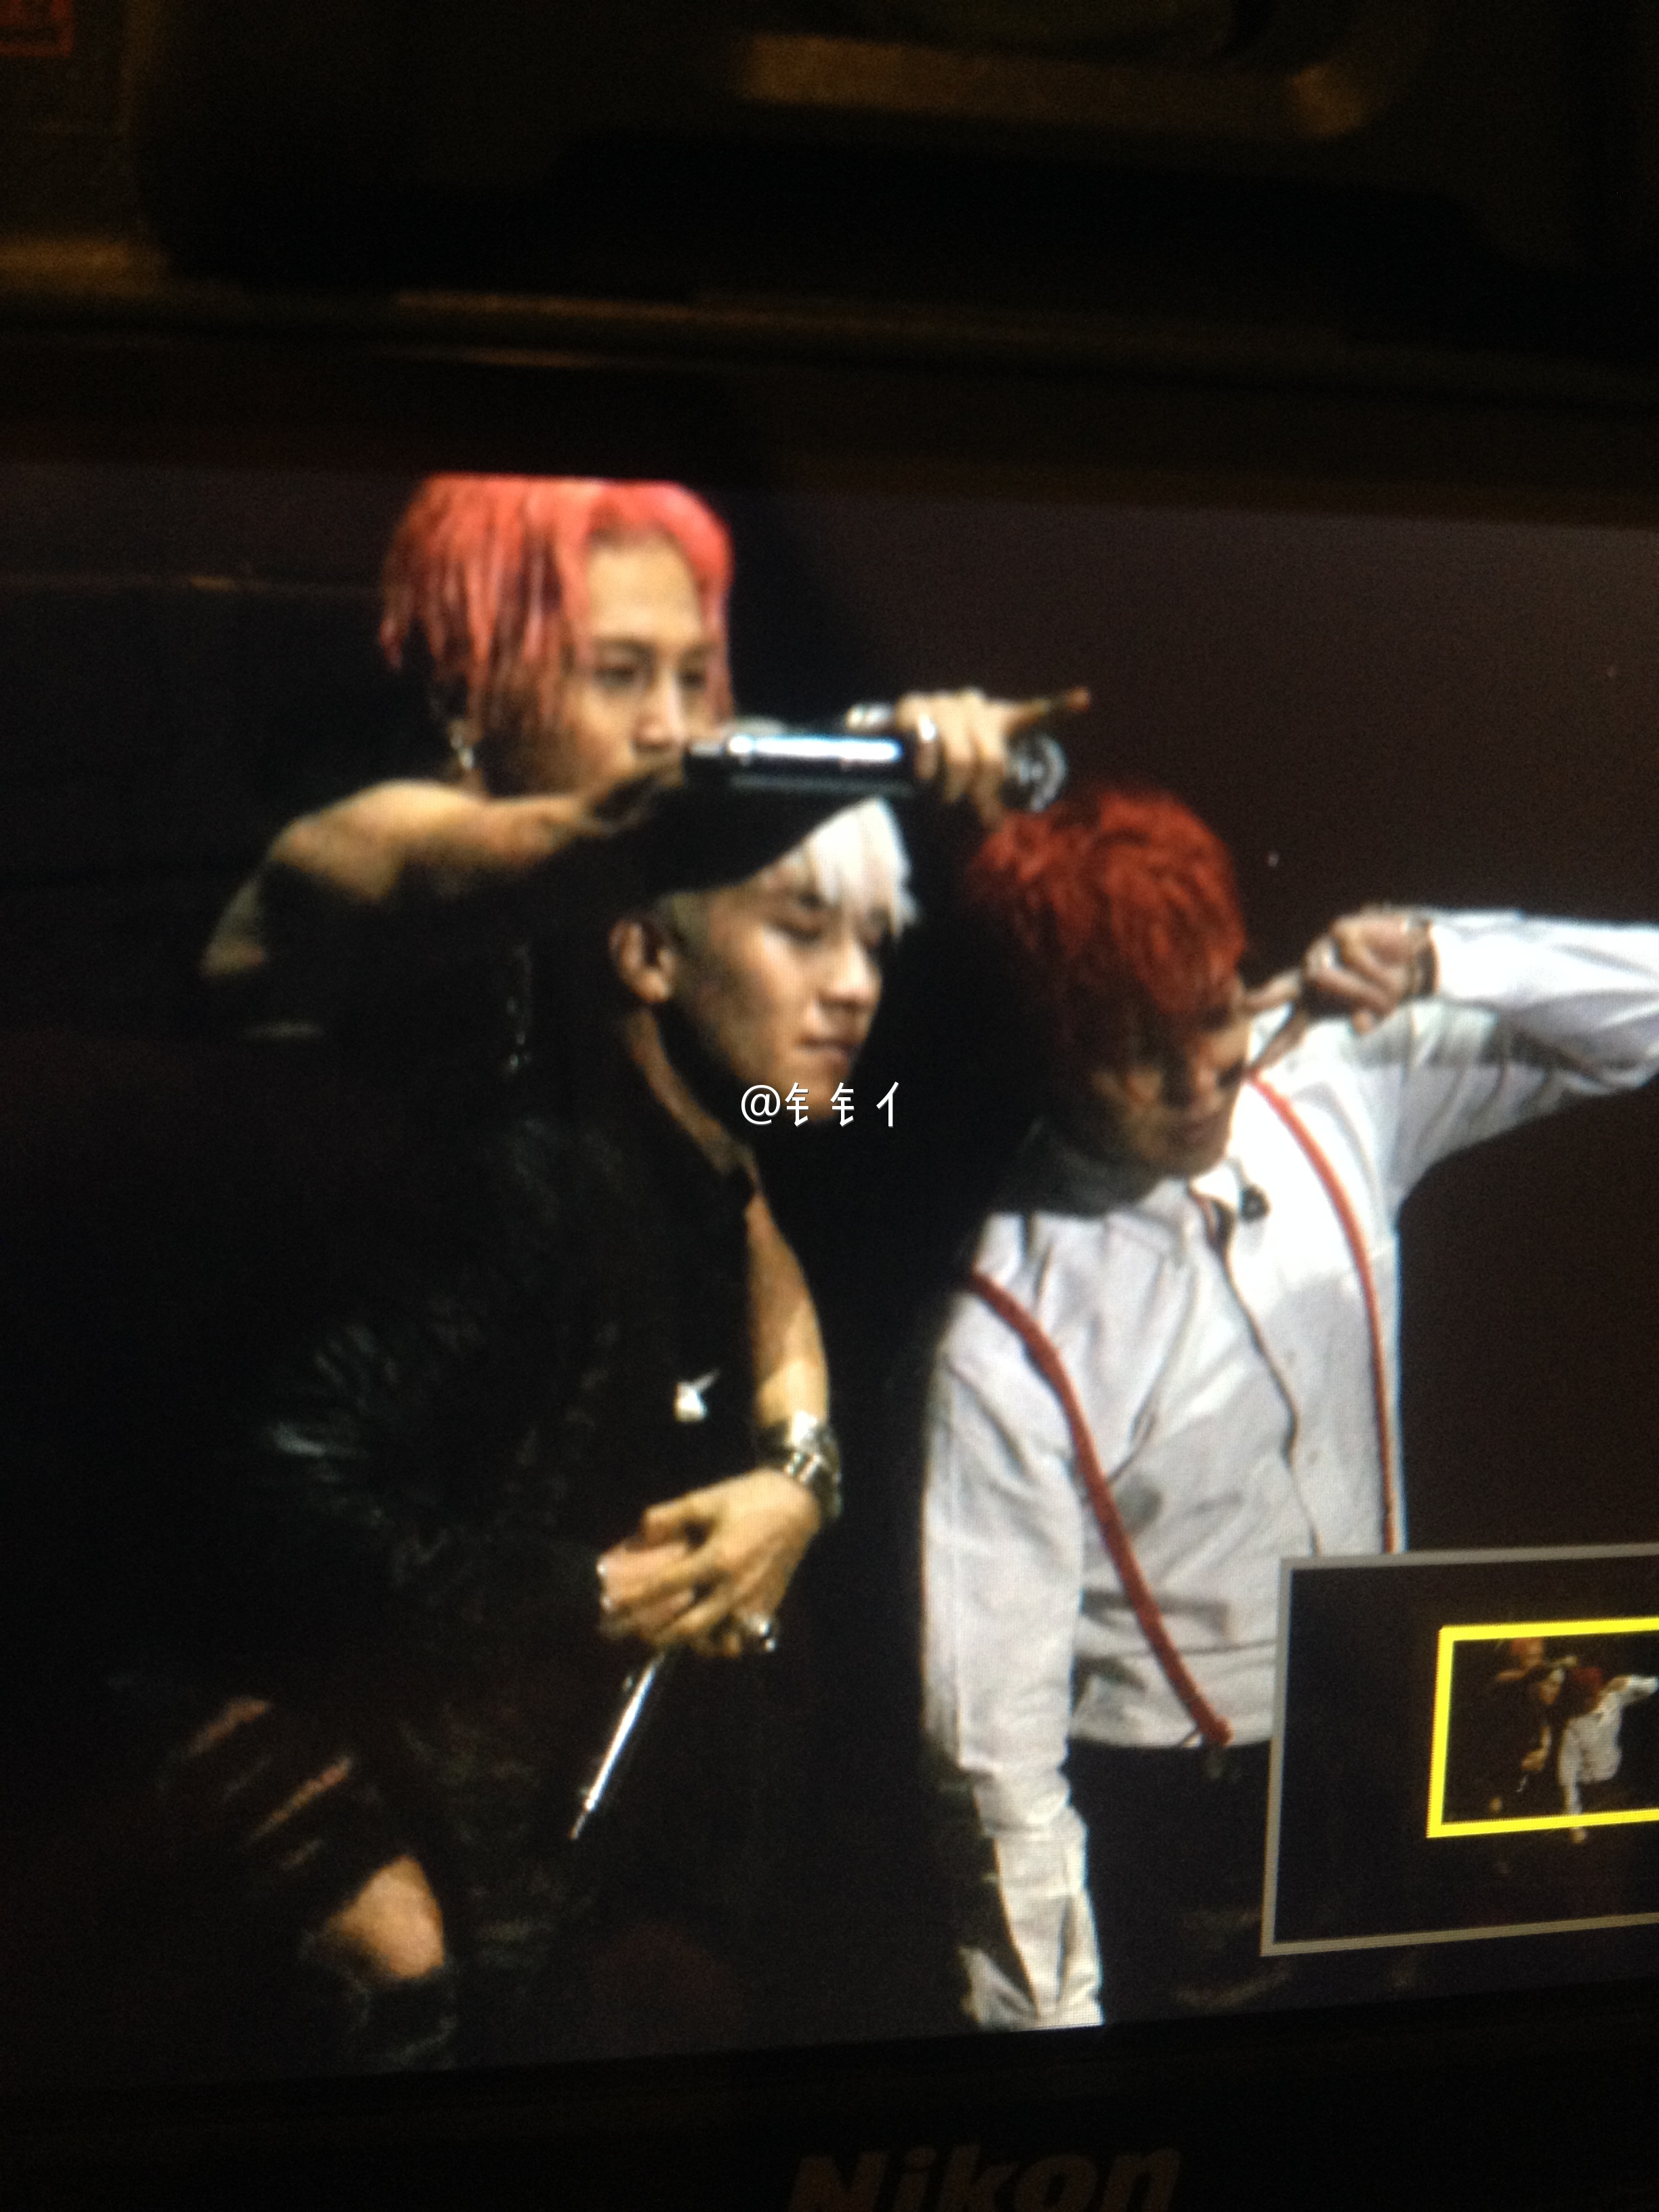 BIGBANG - Made Tour 2015 - Beijing - 05jun2015 - ??? - 01.jpg